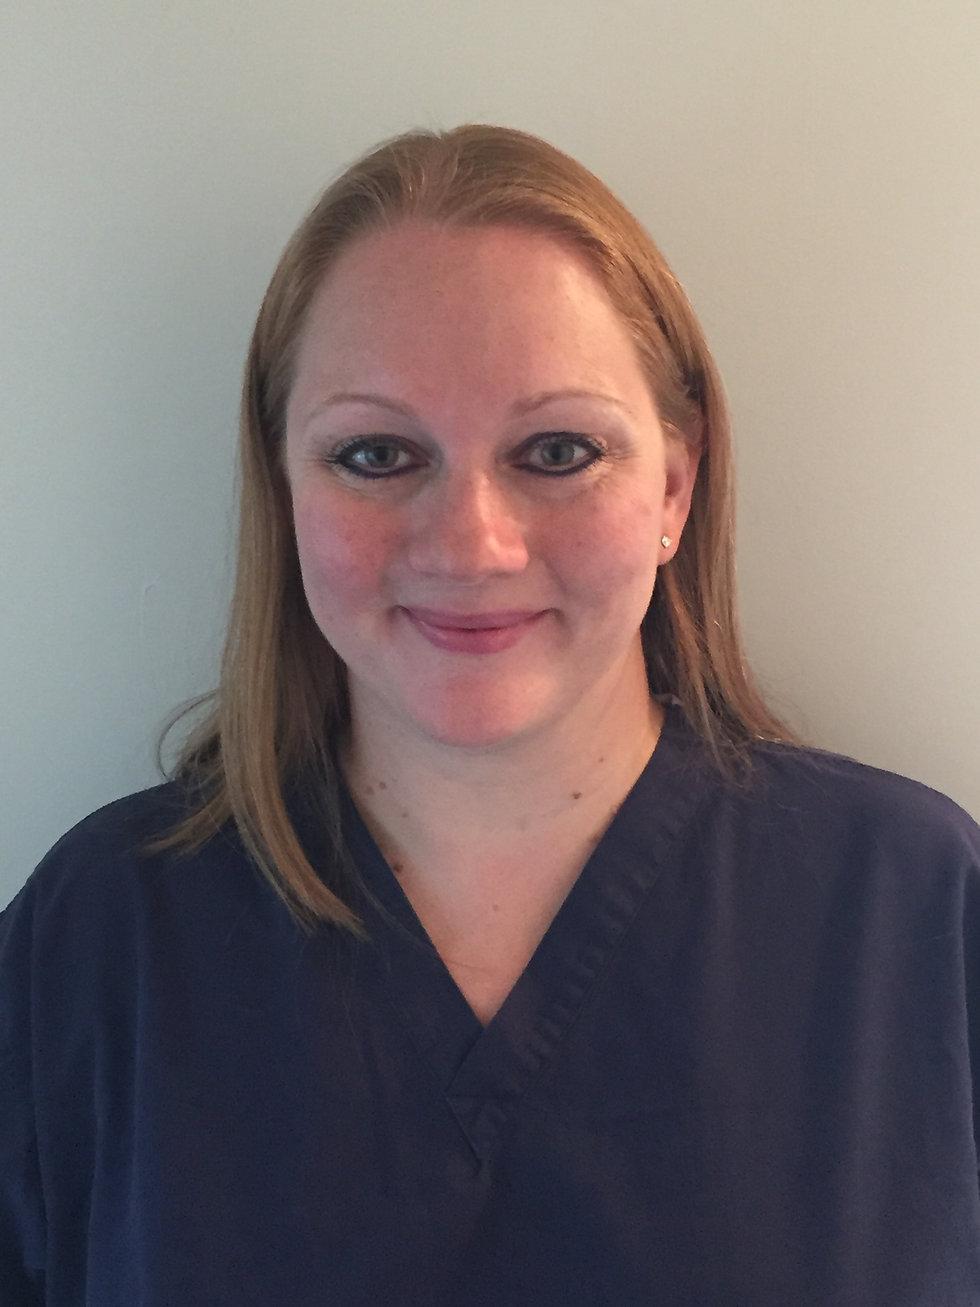 Dr Catherine Lightowler